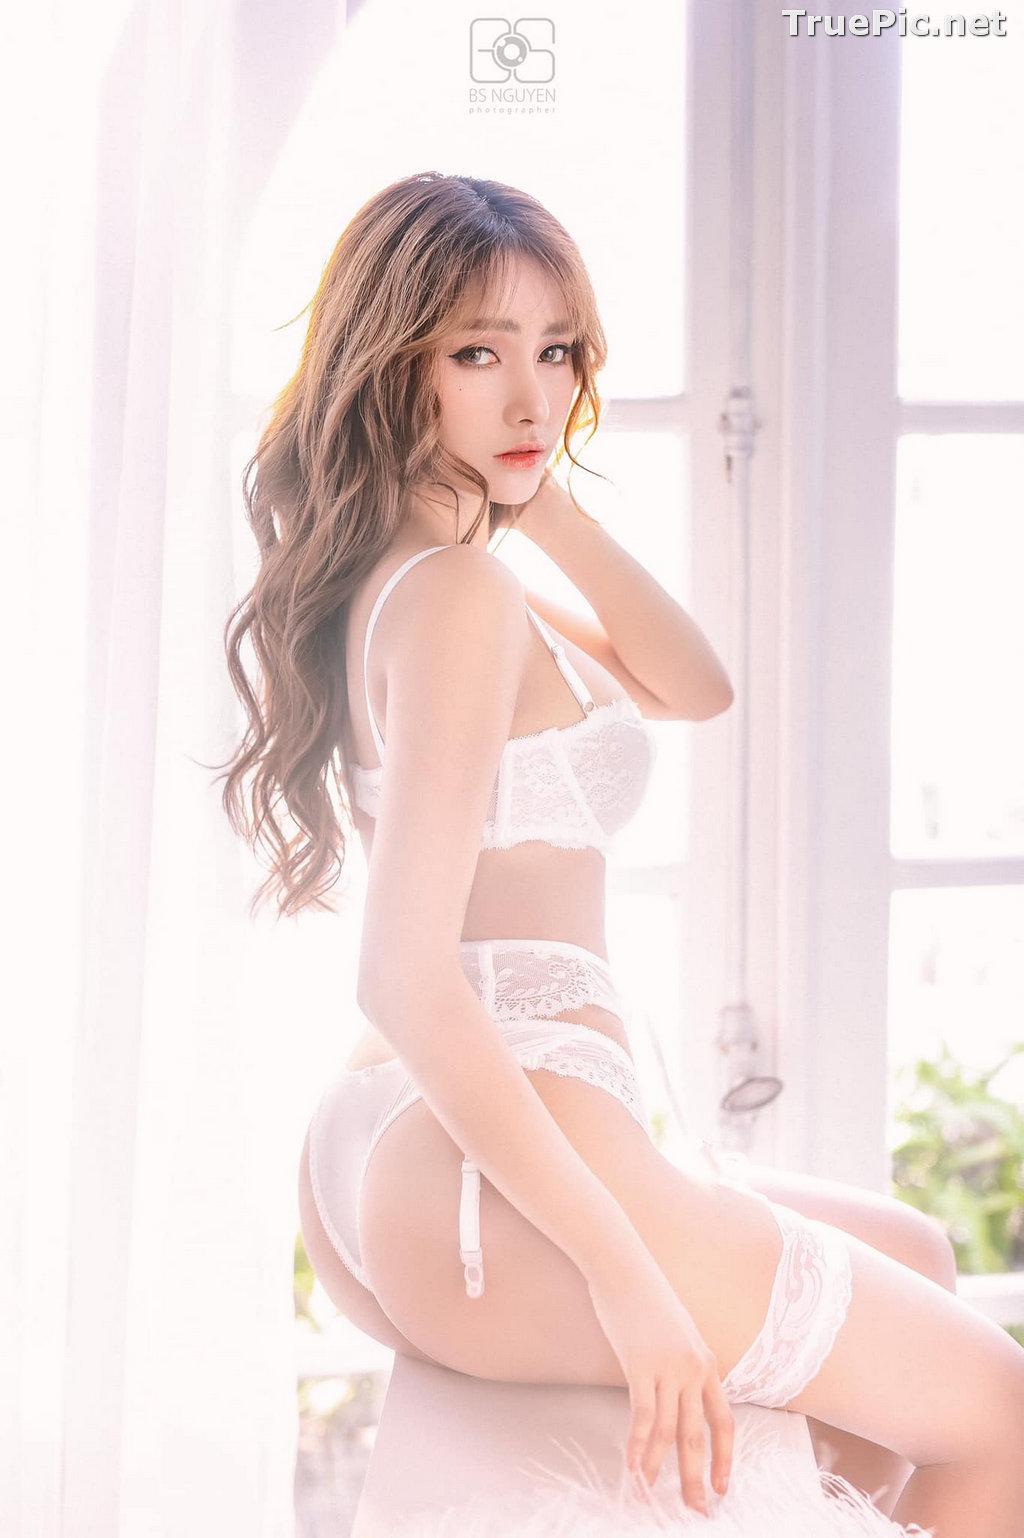 Image Vietnamese Model - Nguyen Thi Phi Yen - Beautiful Sexy White Lingerie - TruePic.net - Picture-14